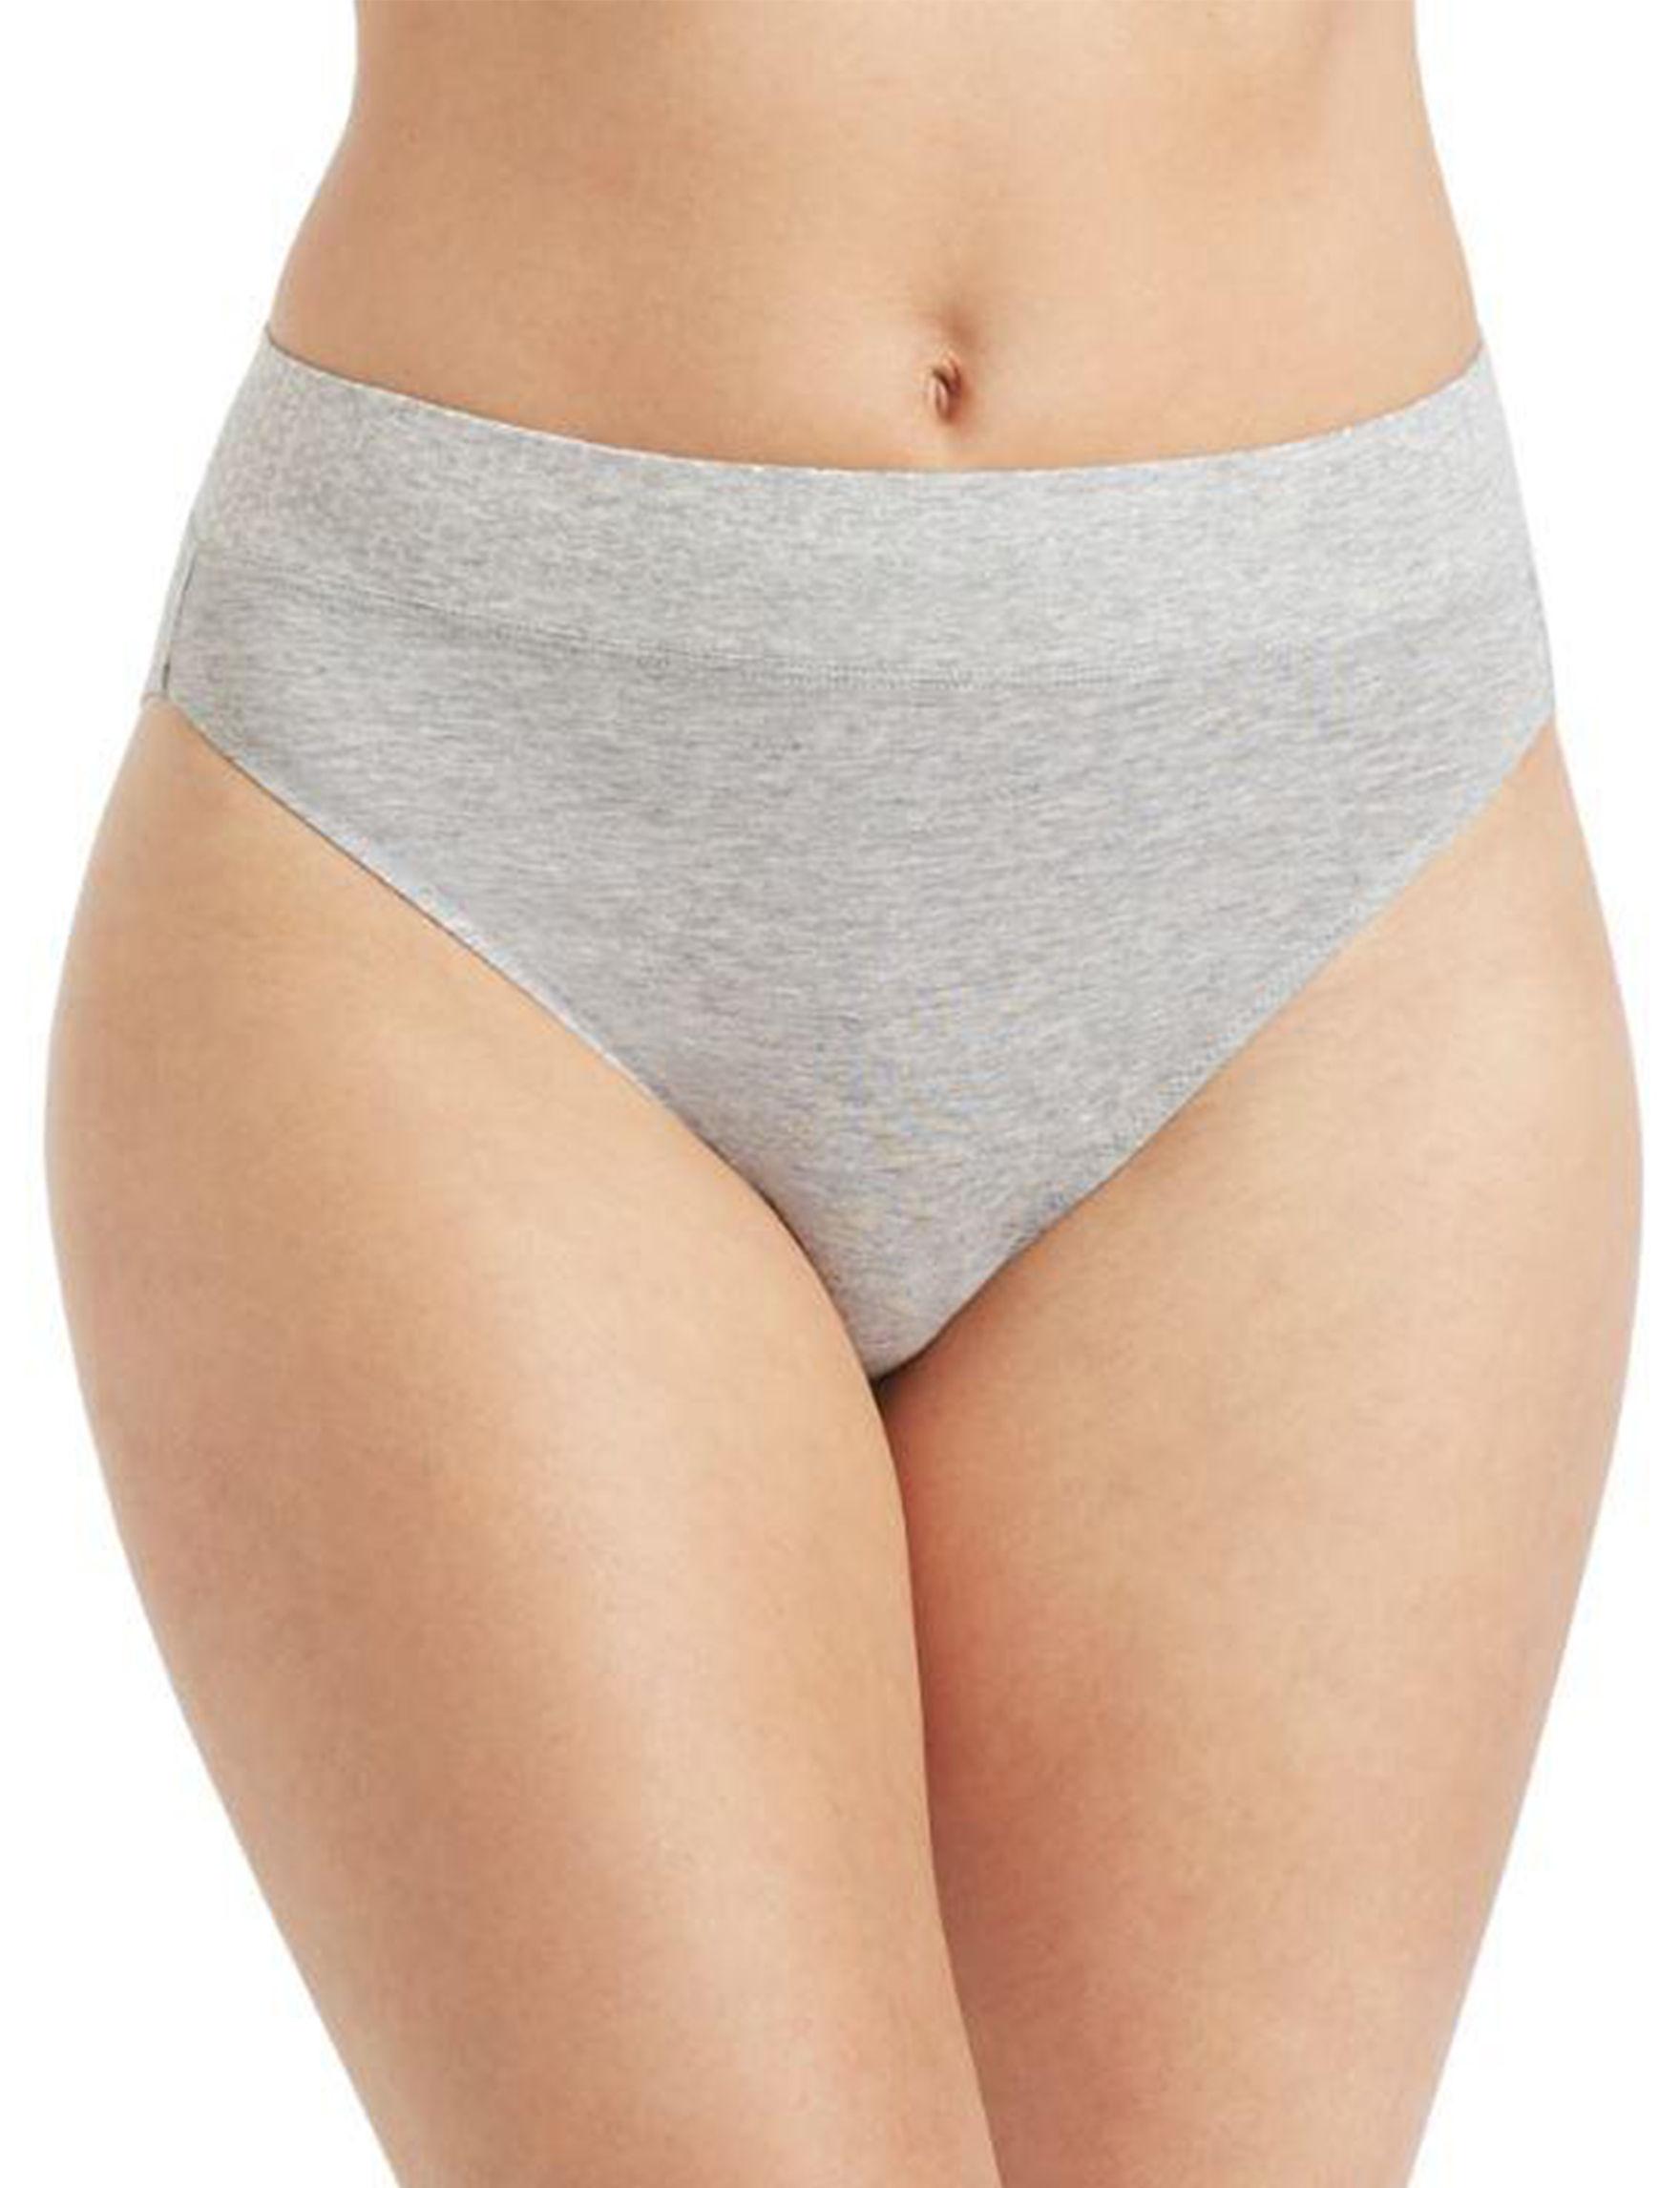 Ellen Tracy Heather Grey Panties High Cut